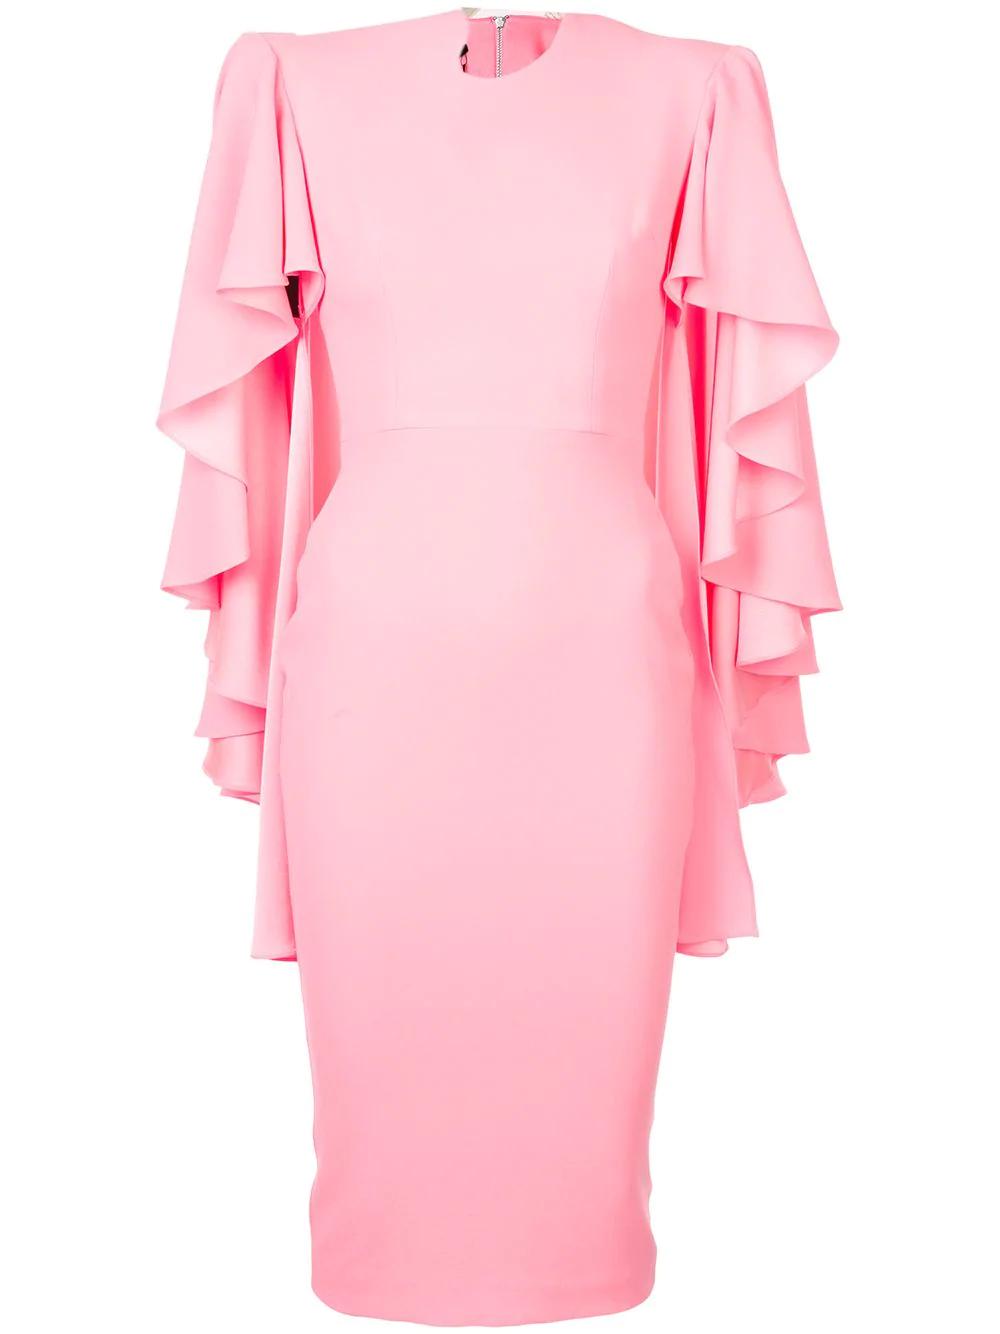 f0c490d70c4 Alex Perry Cori Dress - Pink